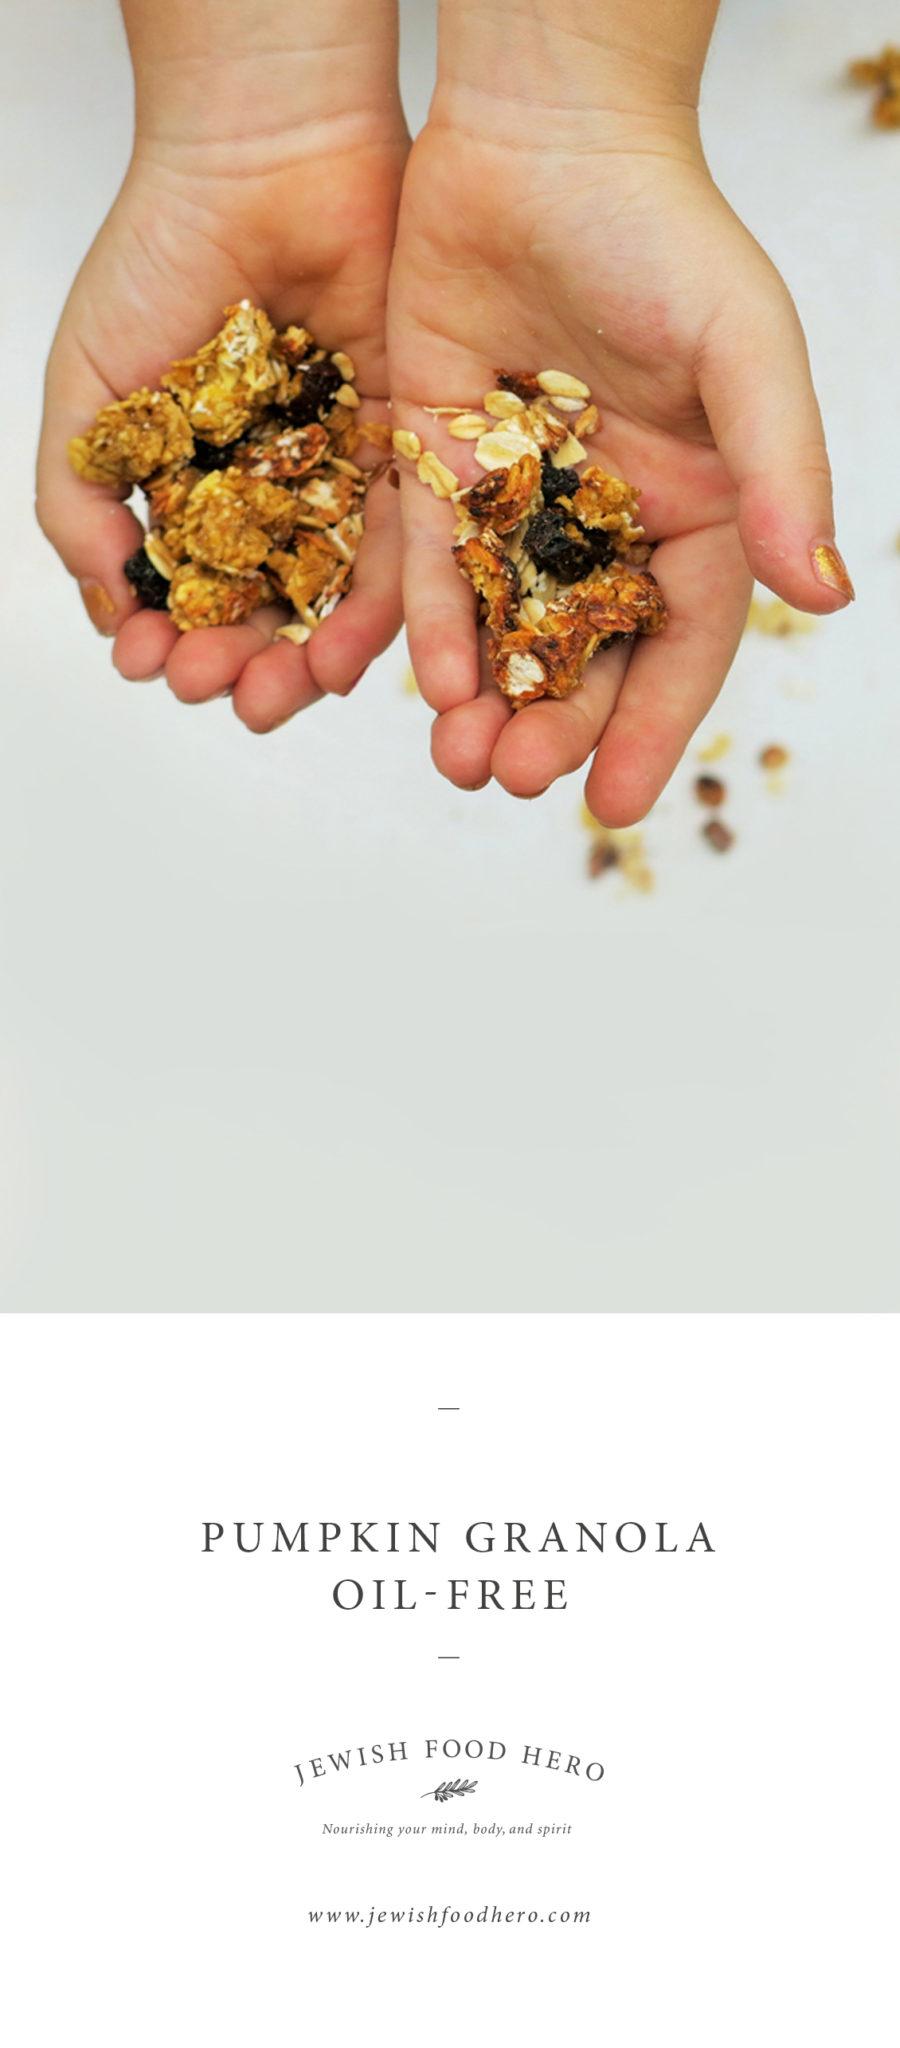 pumpkin-granola oil-free